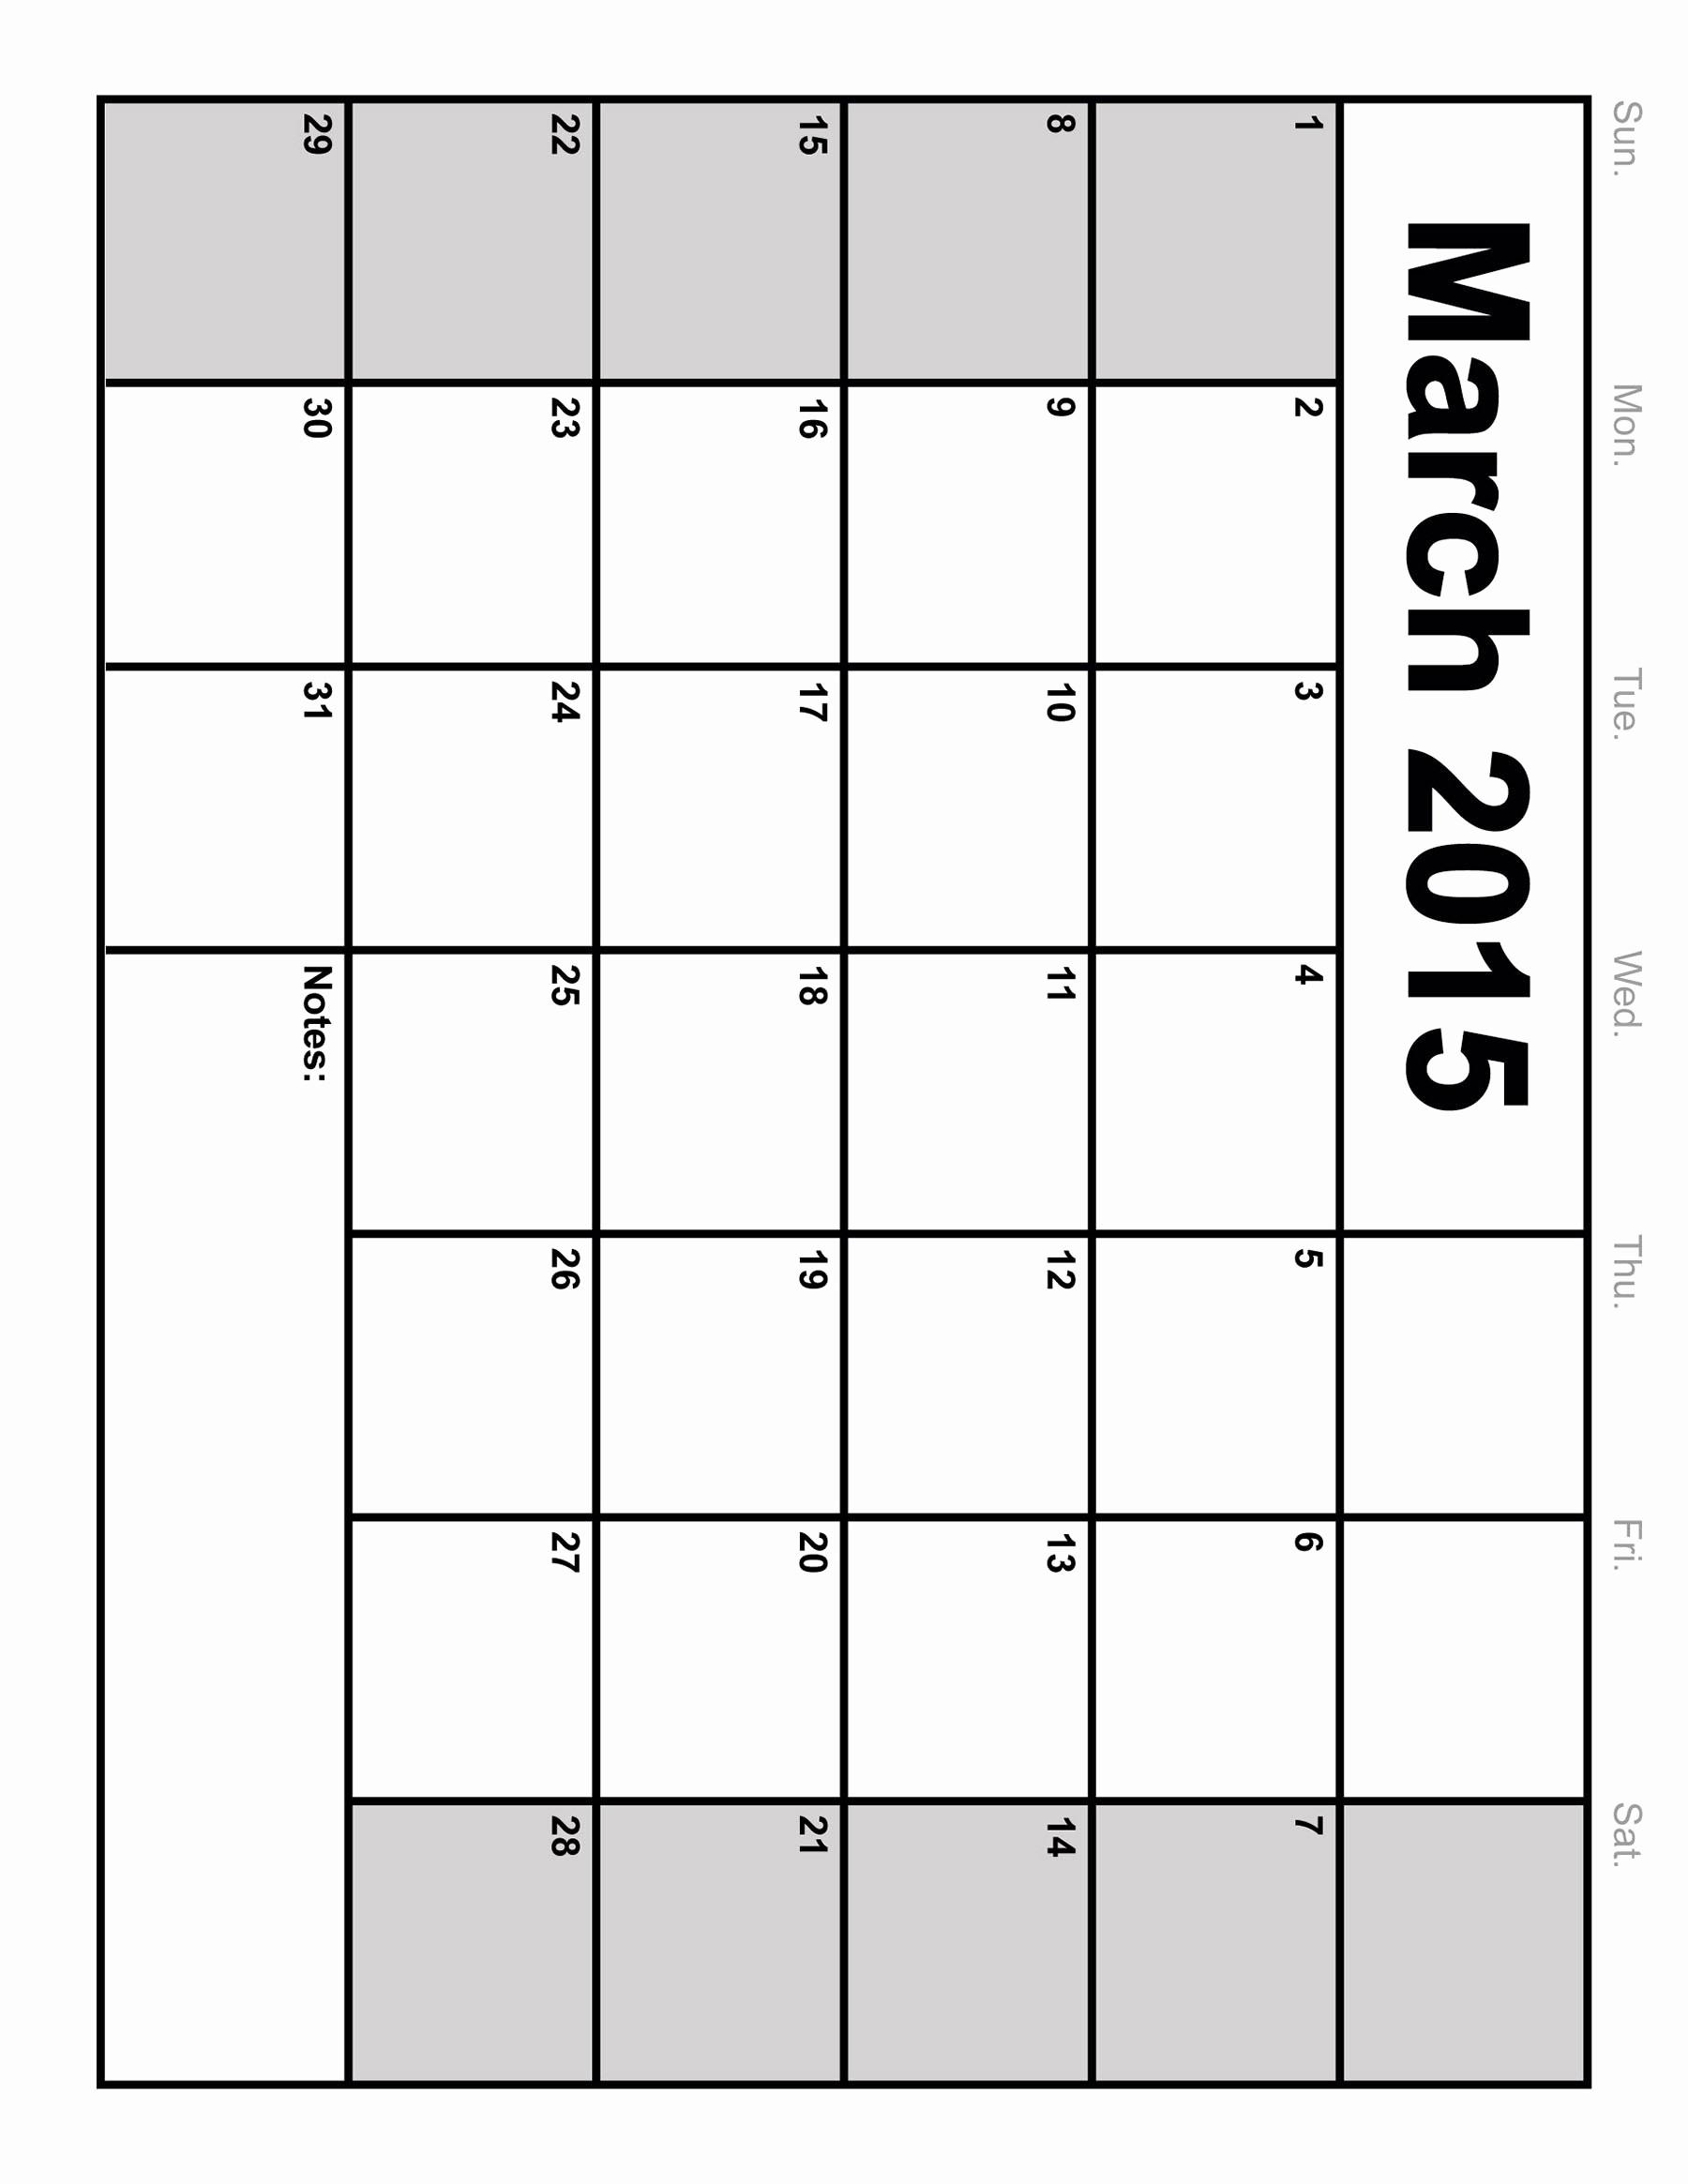 Printable Blank Monthly Calendar Template Unique March 2015 Calendar Printable Monthly Blank Calendar 2015